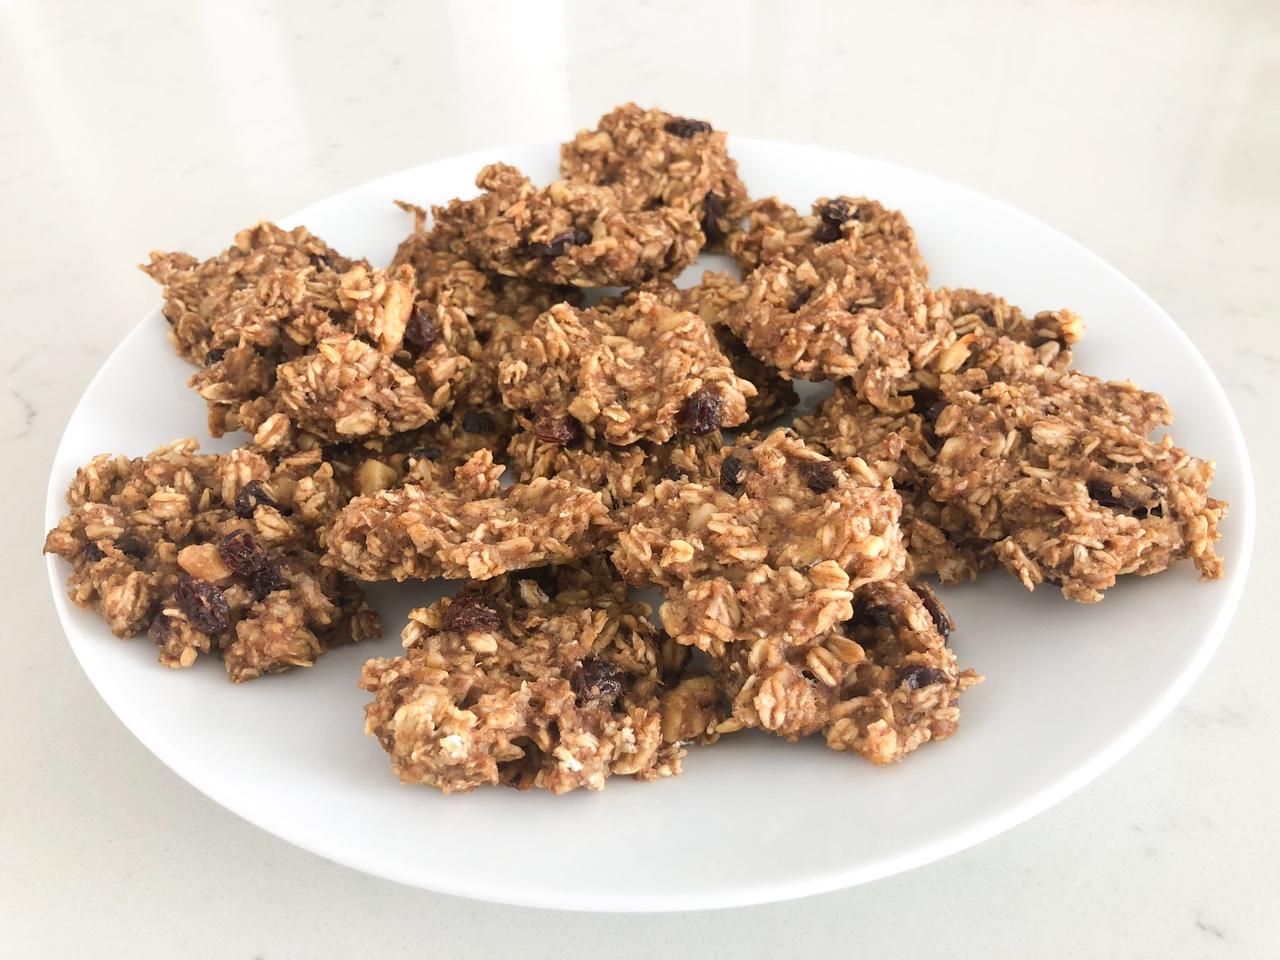 Barbara's Healthy Oatmeal Cookies